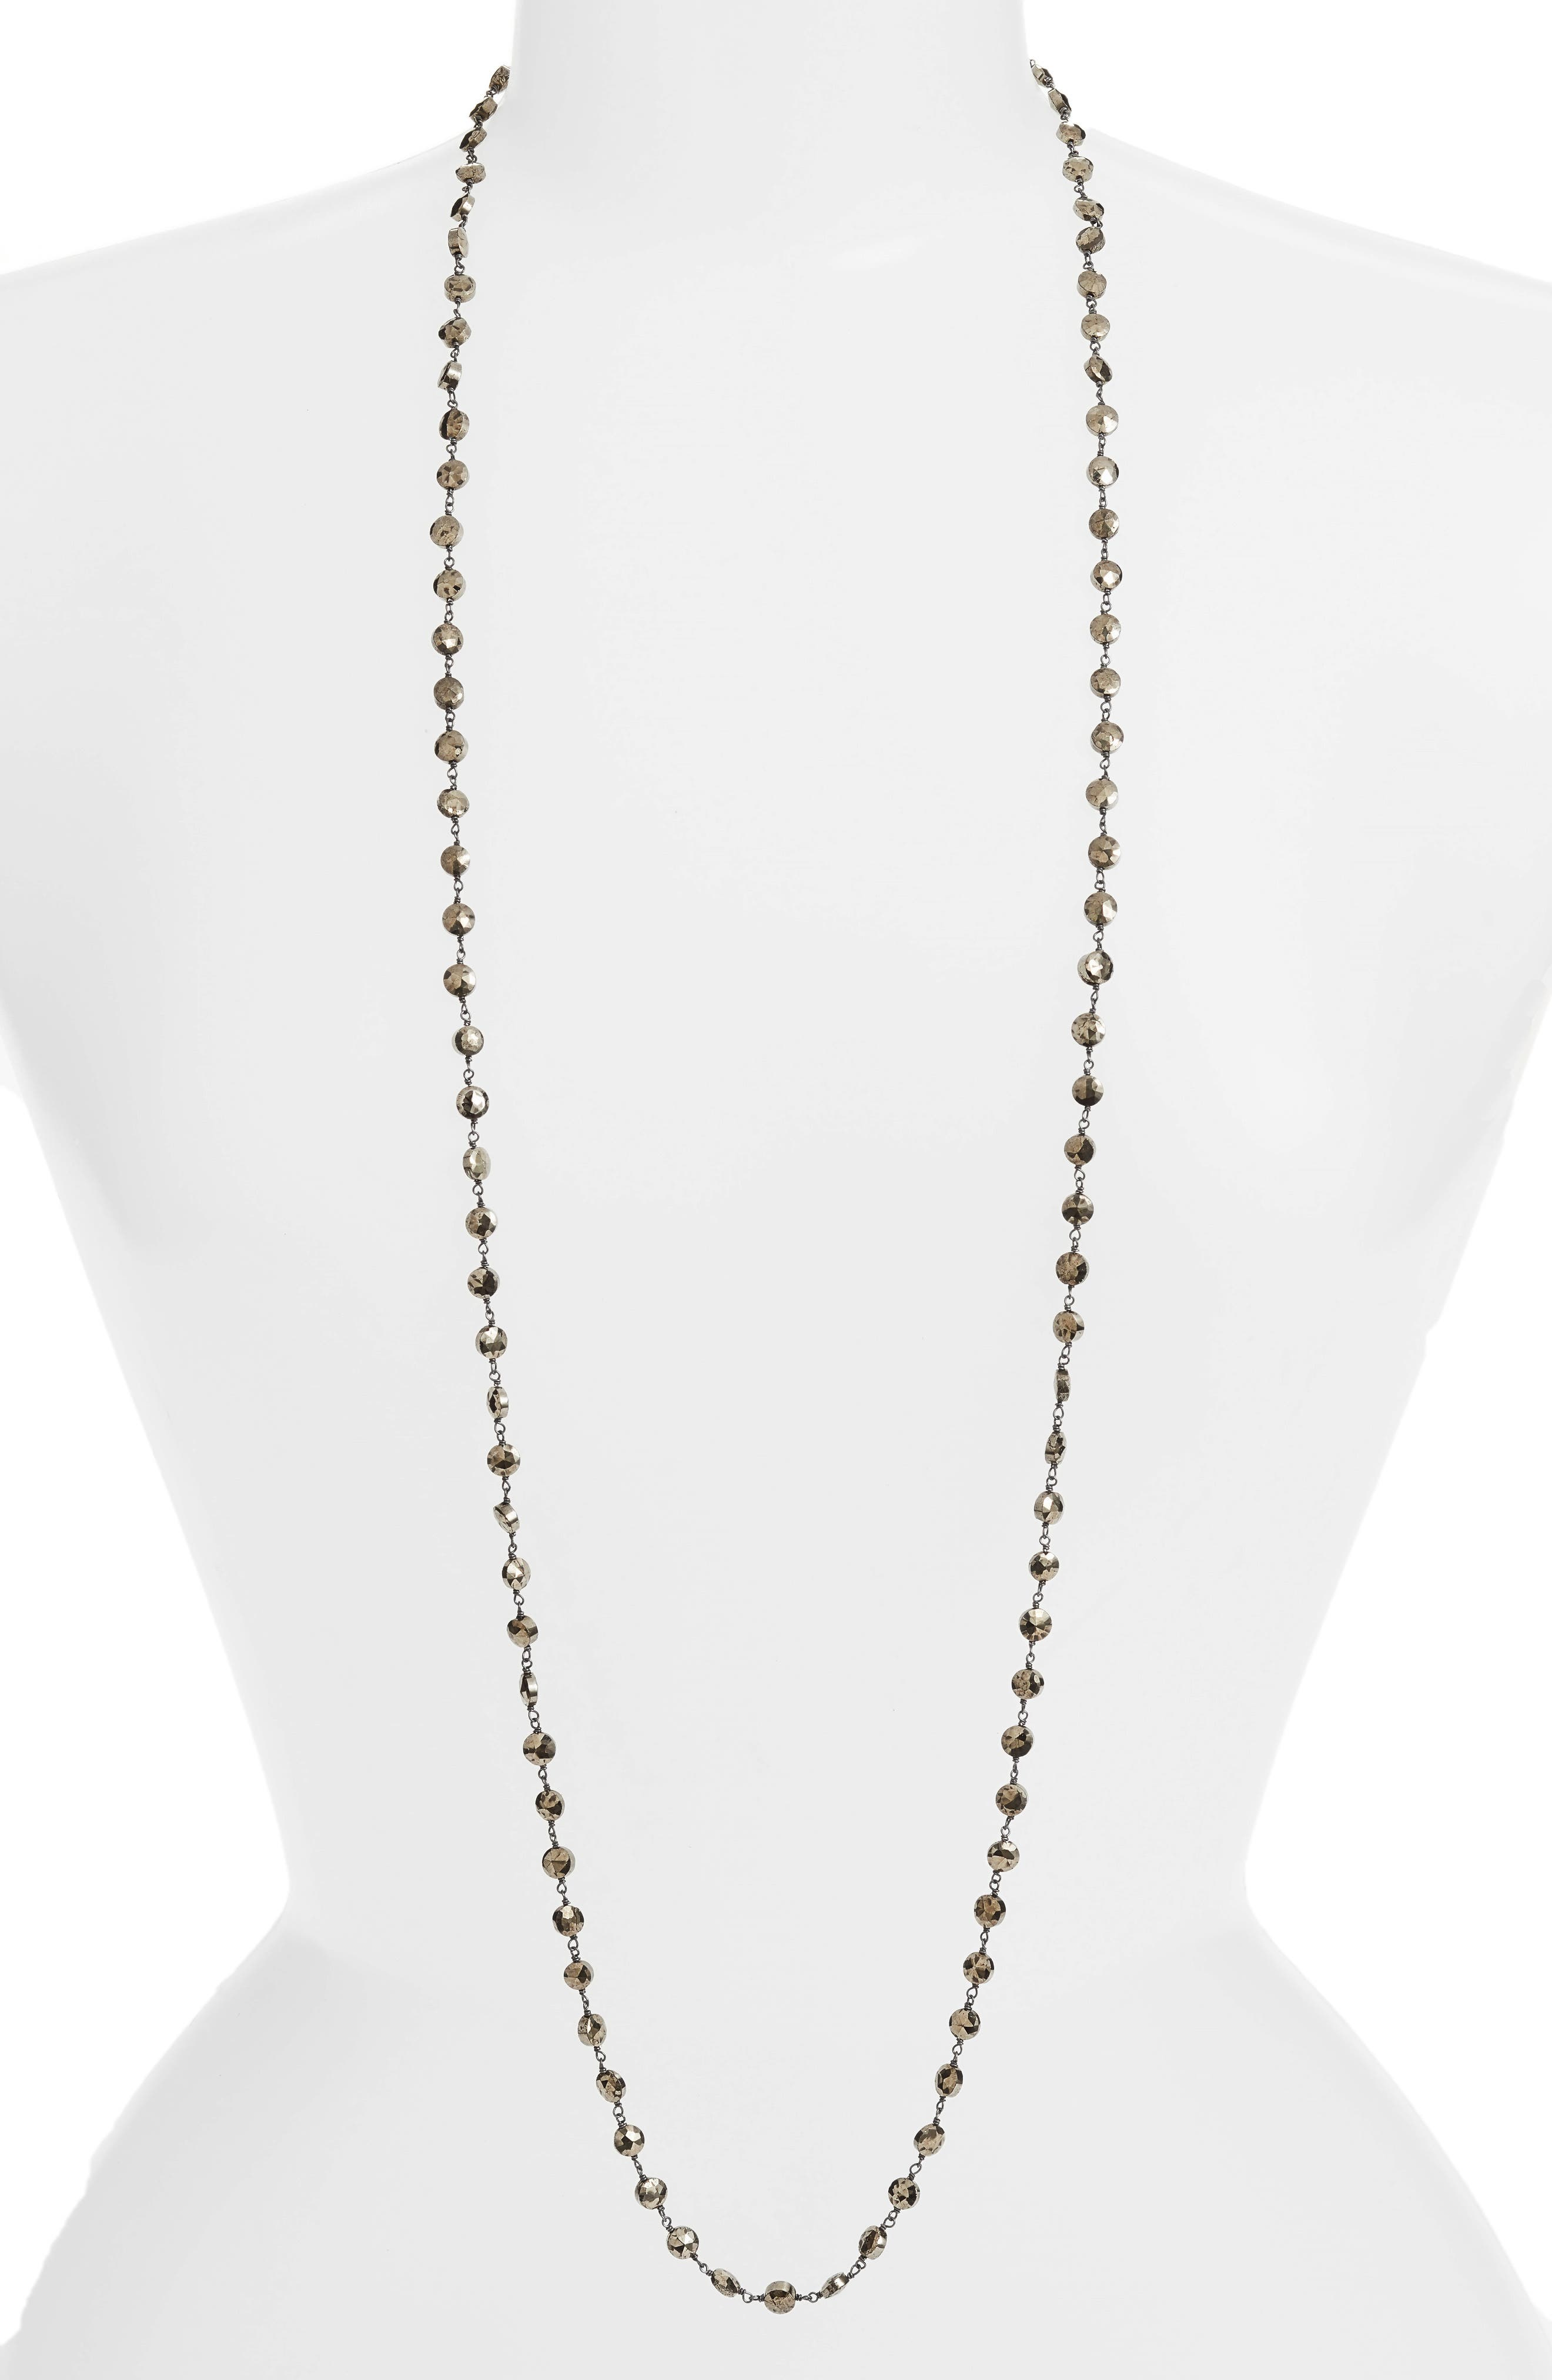 Diana Coin Necklace,                             Main thumbnail 1, color,                             PYRITE/ SILVER